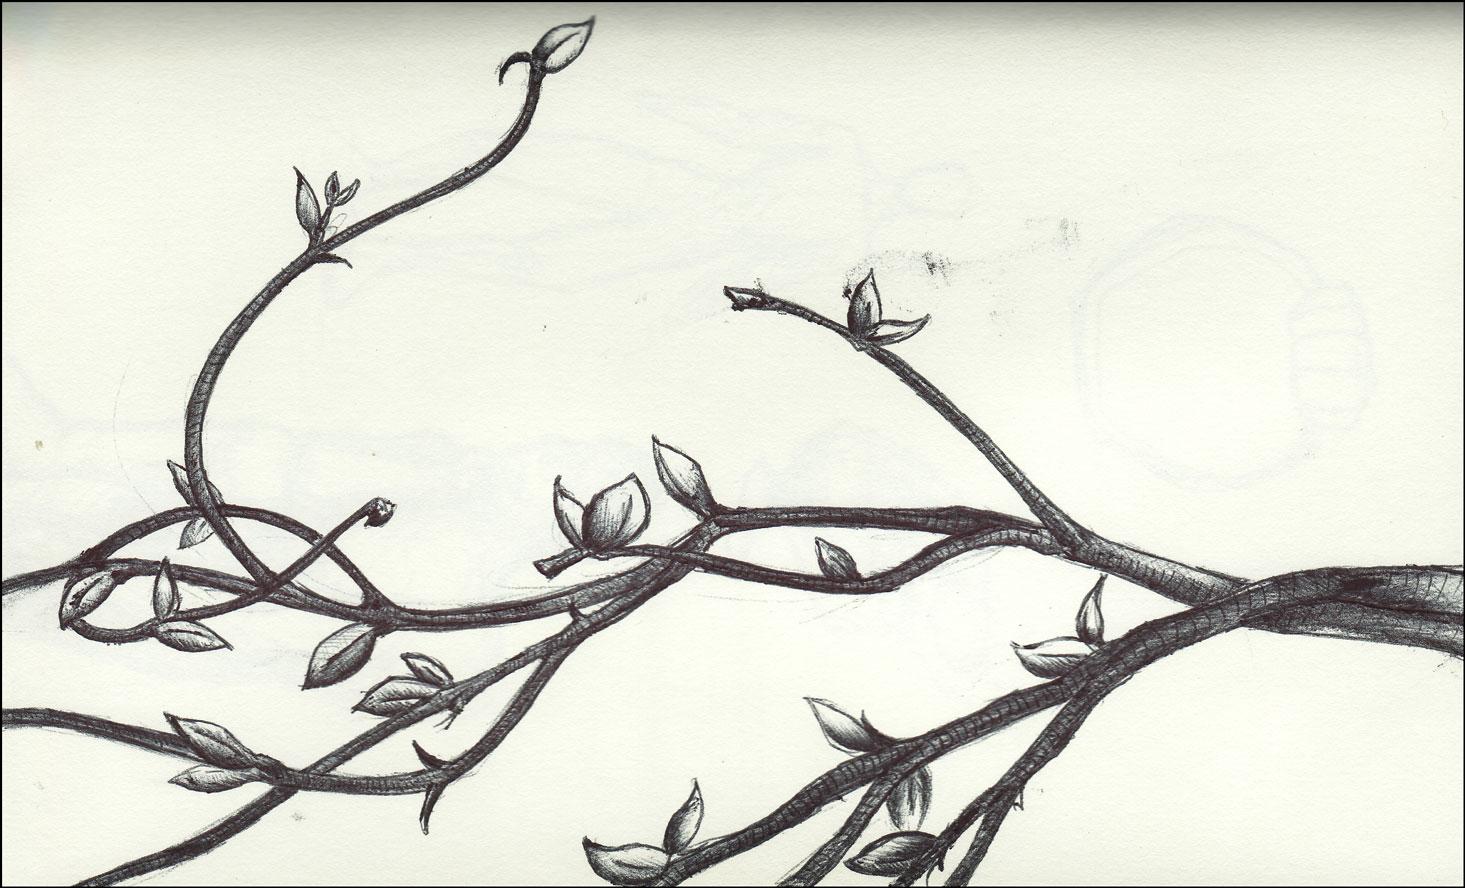 1465x888 Vine Drawing Vines.jpg A Tattoos Vine Drawing